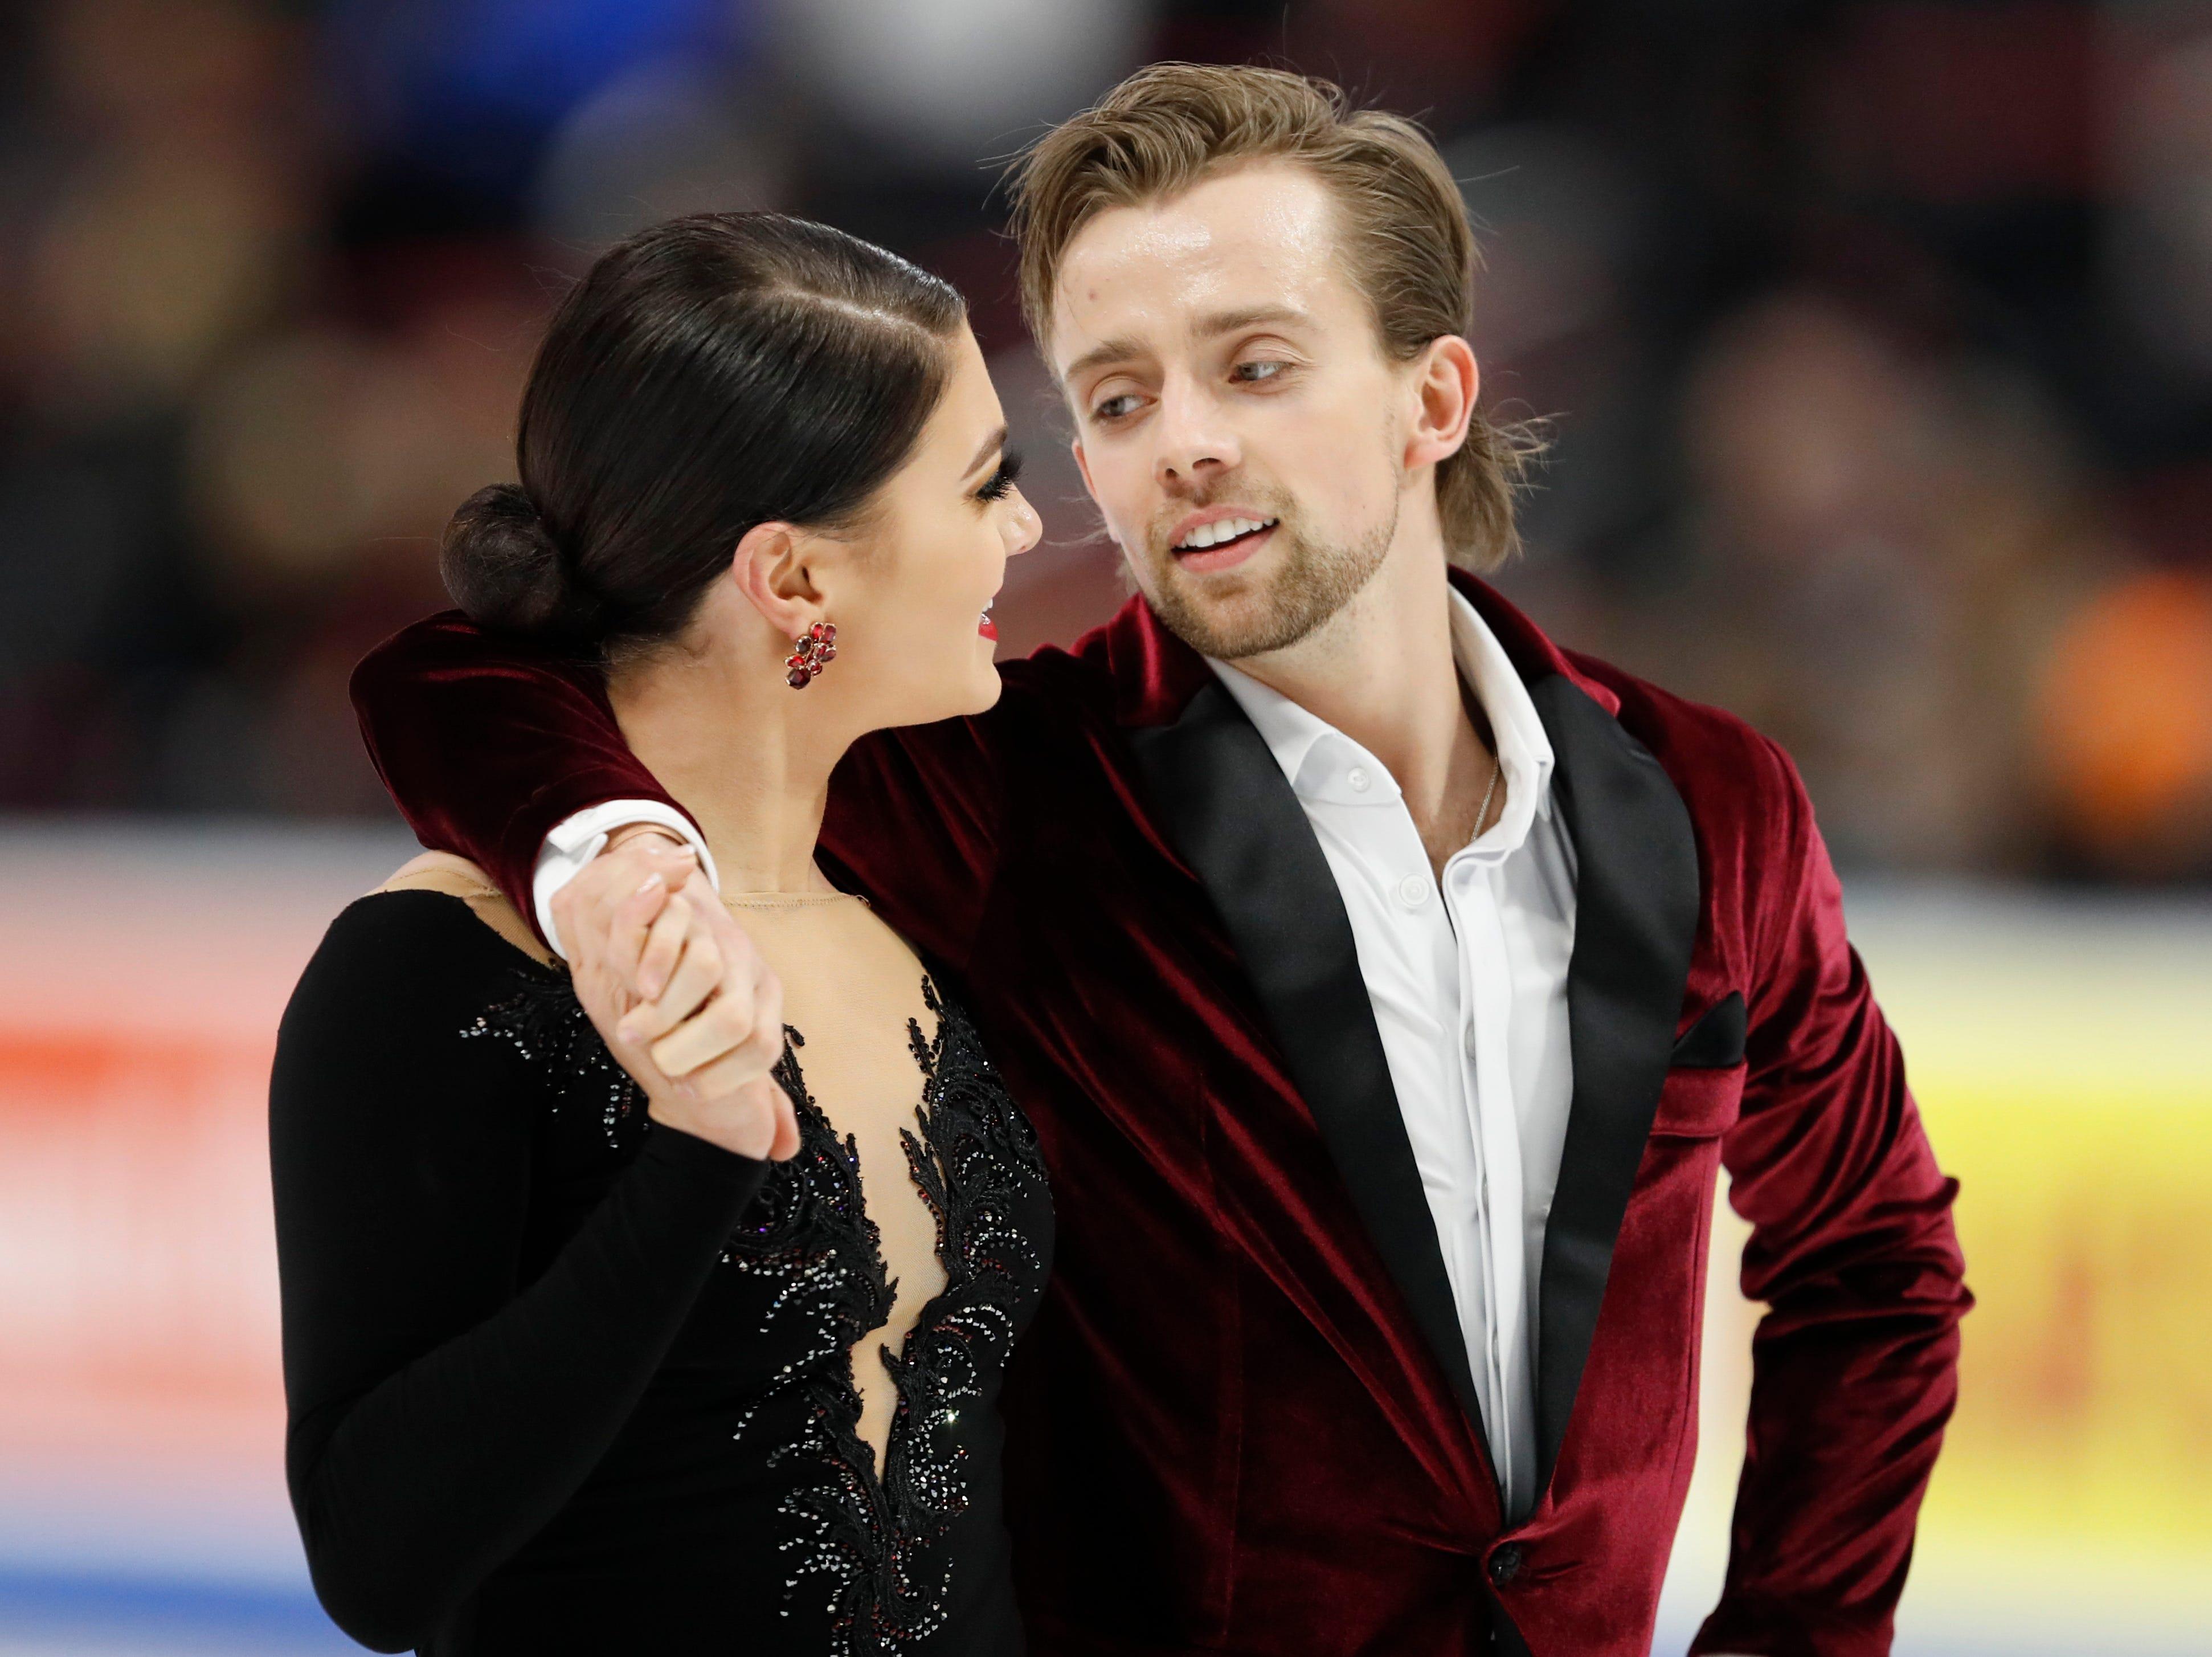 Kaitlin Hawayek and Jean-Luc Baker react after their performance in the rhythm dance program.